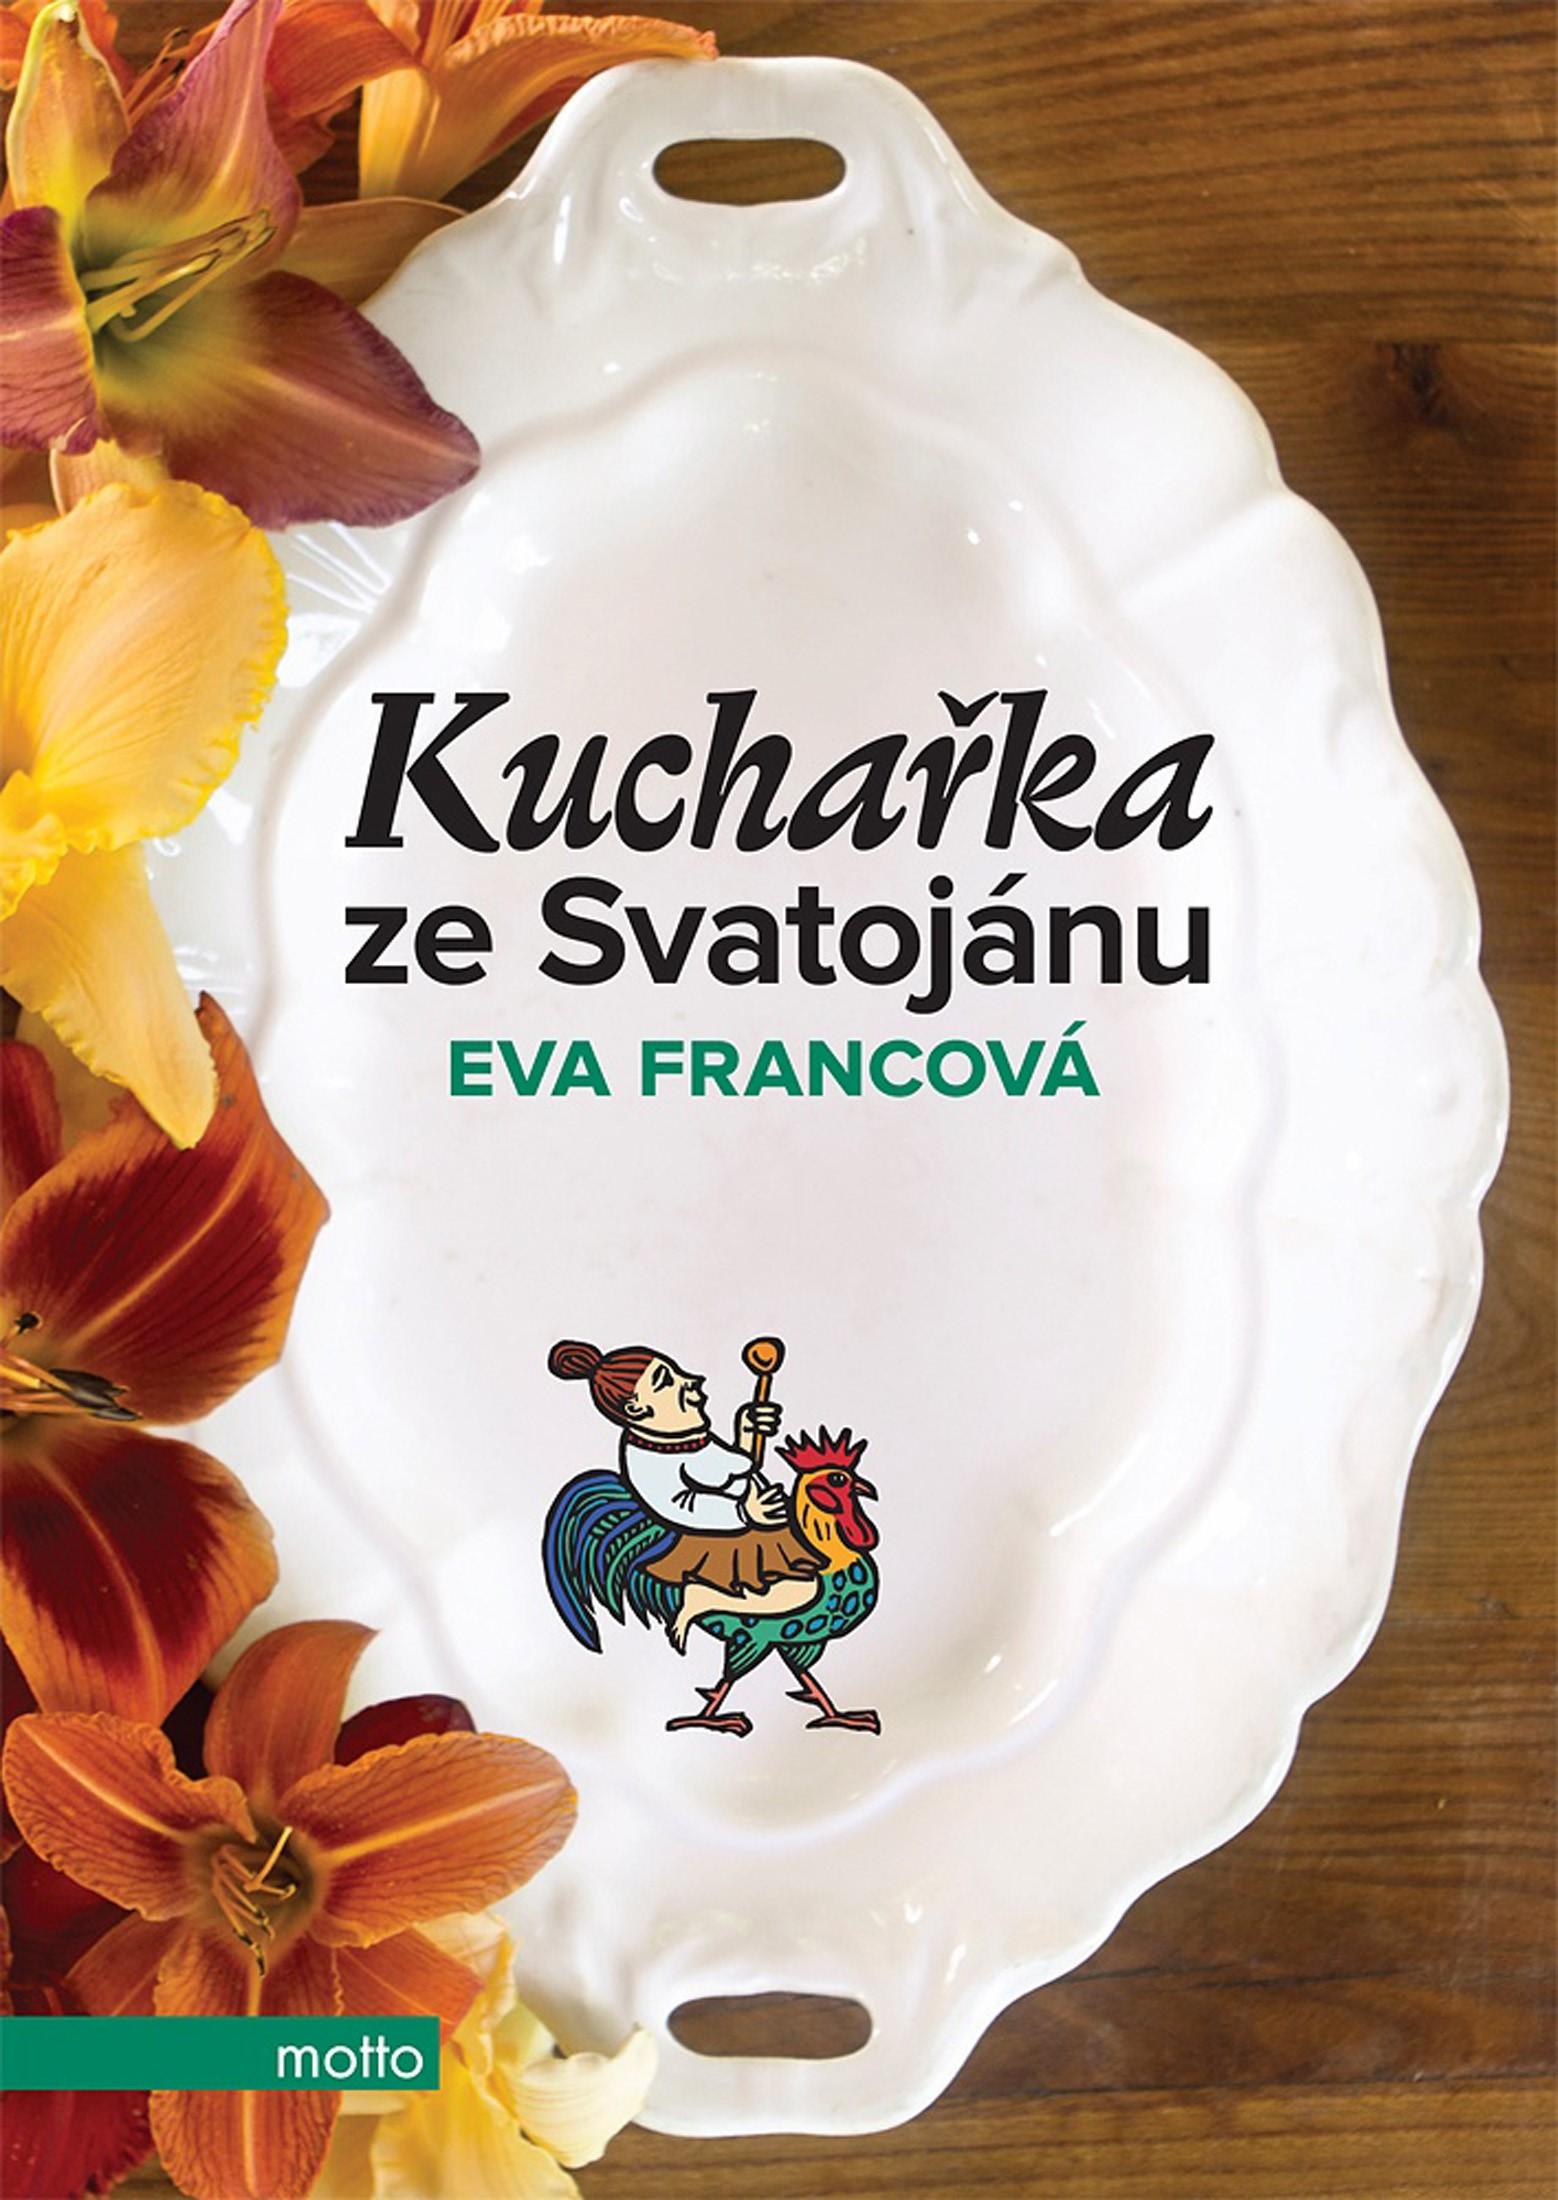 Kuchařka ze Svatojánu